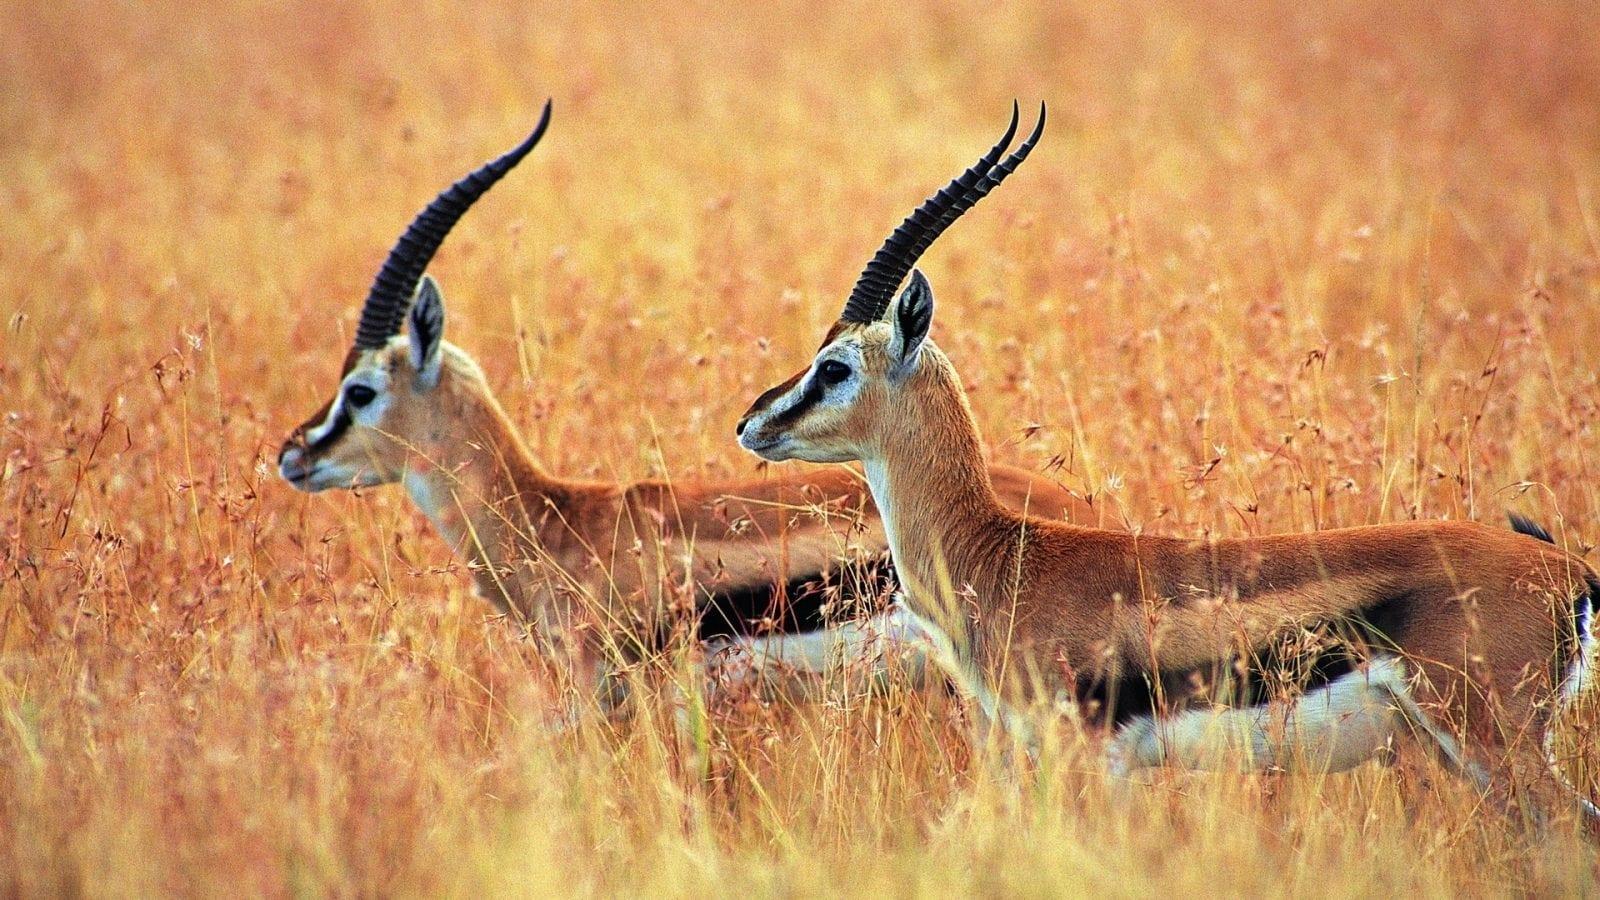 tibetan antelope 1920x1080 - Comorile din Kashmir